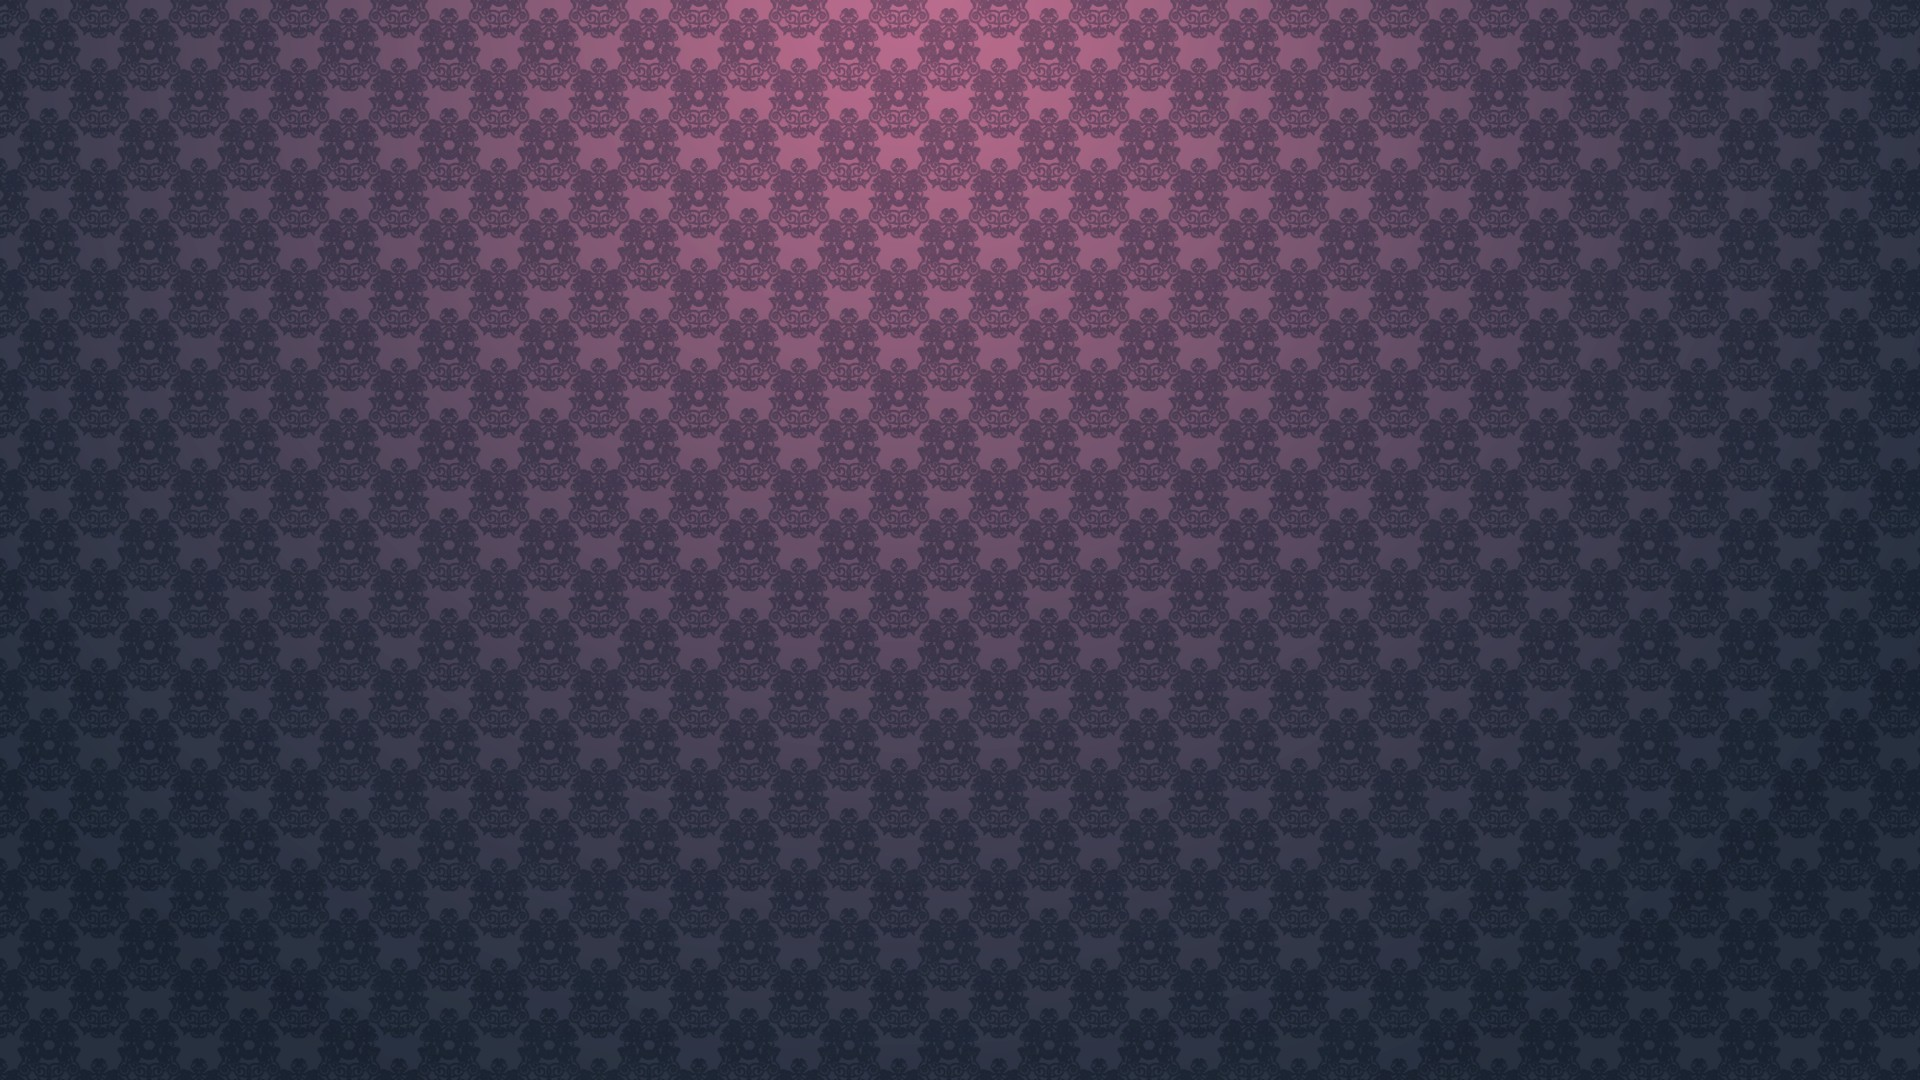 Royal Background 183 ① Download Free Cool High Resolution Backgrounds For Desktop Mobile Laptop